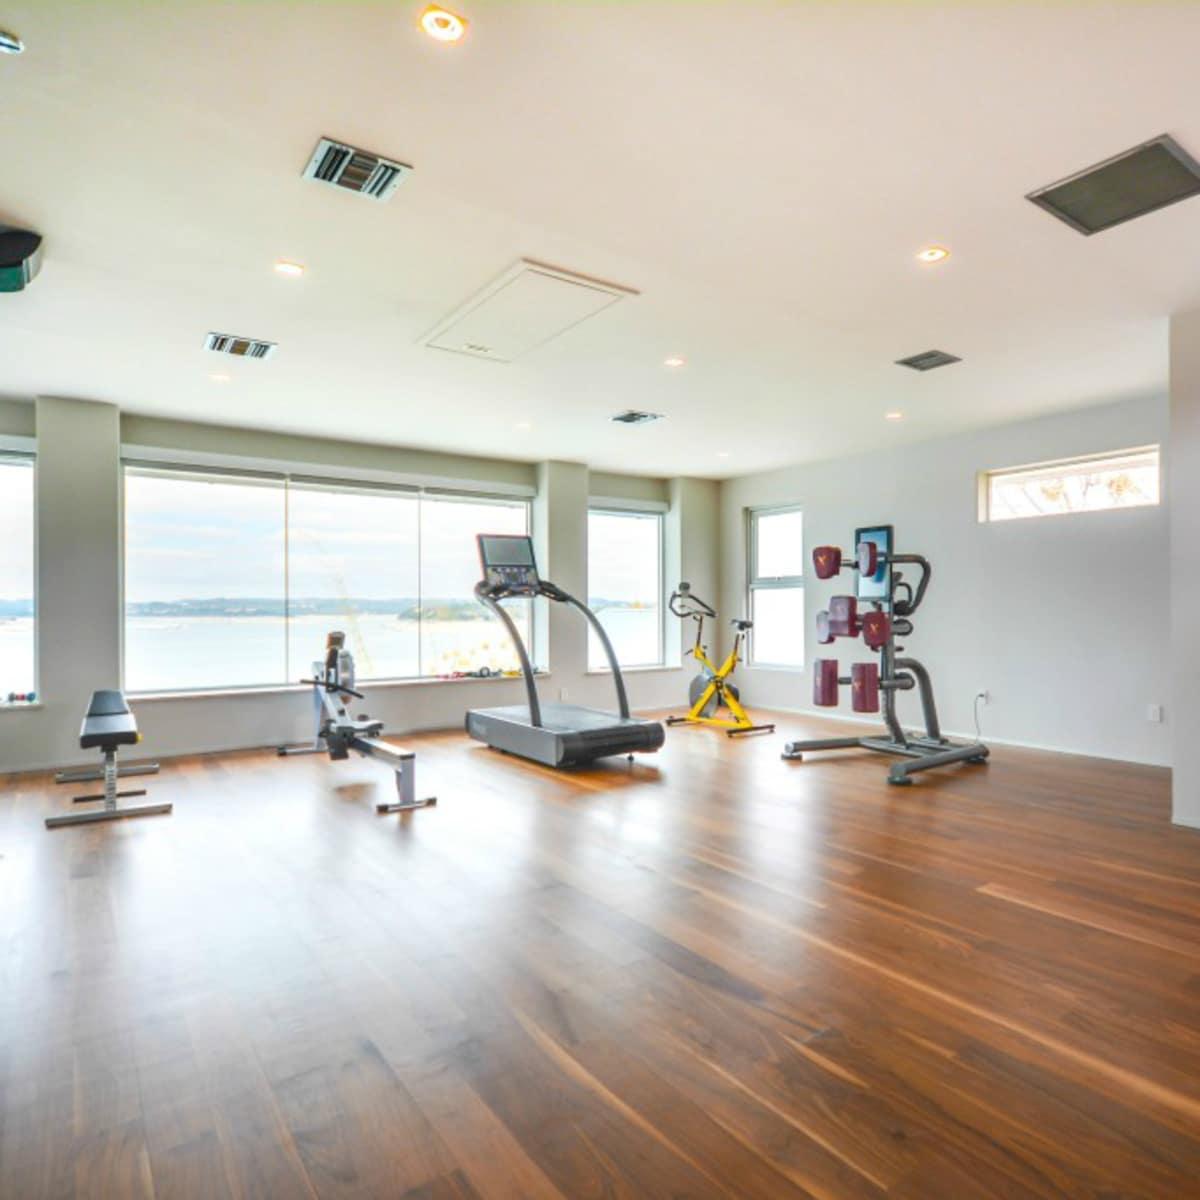 Austin house home Acqua Villa Winn Wittman Lake Travis 14515 Ridgetop Terrace 78732 exercise room